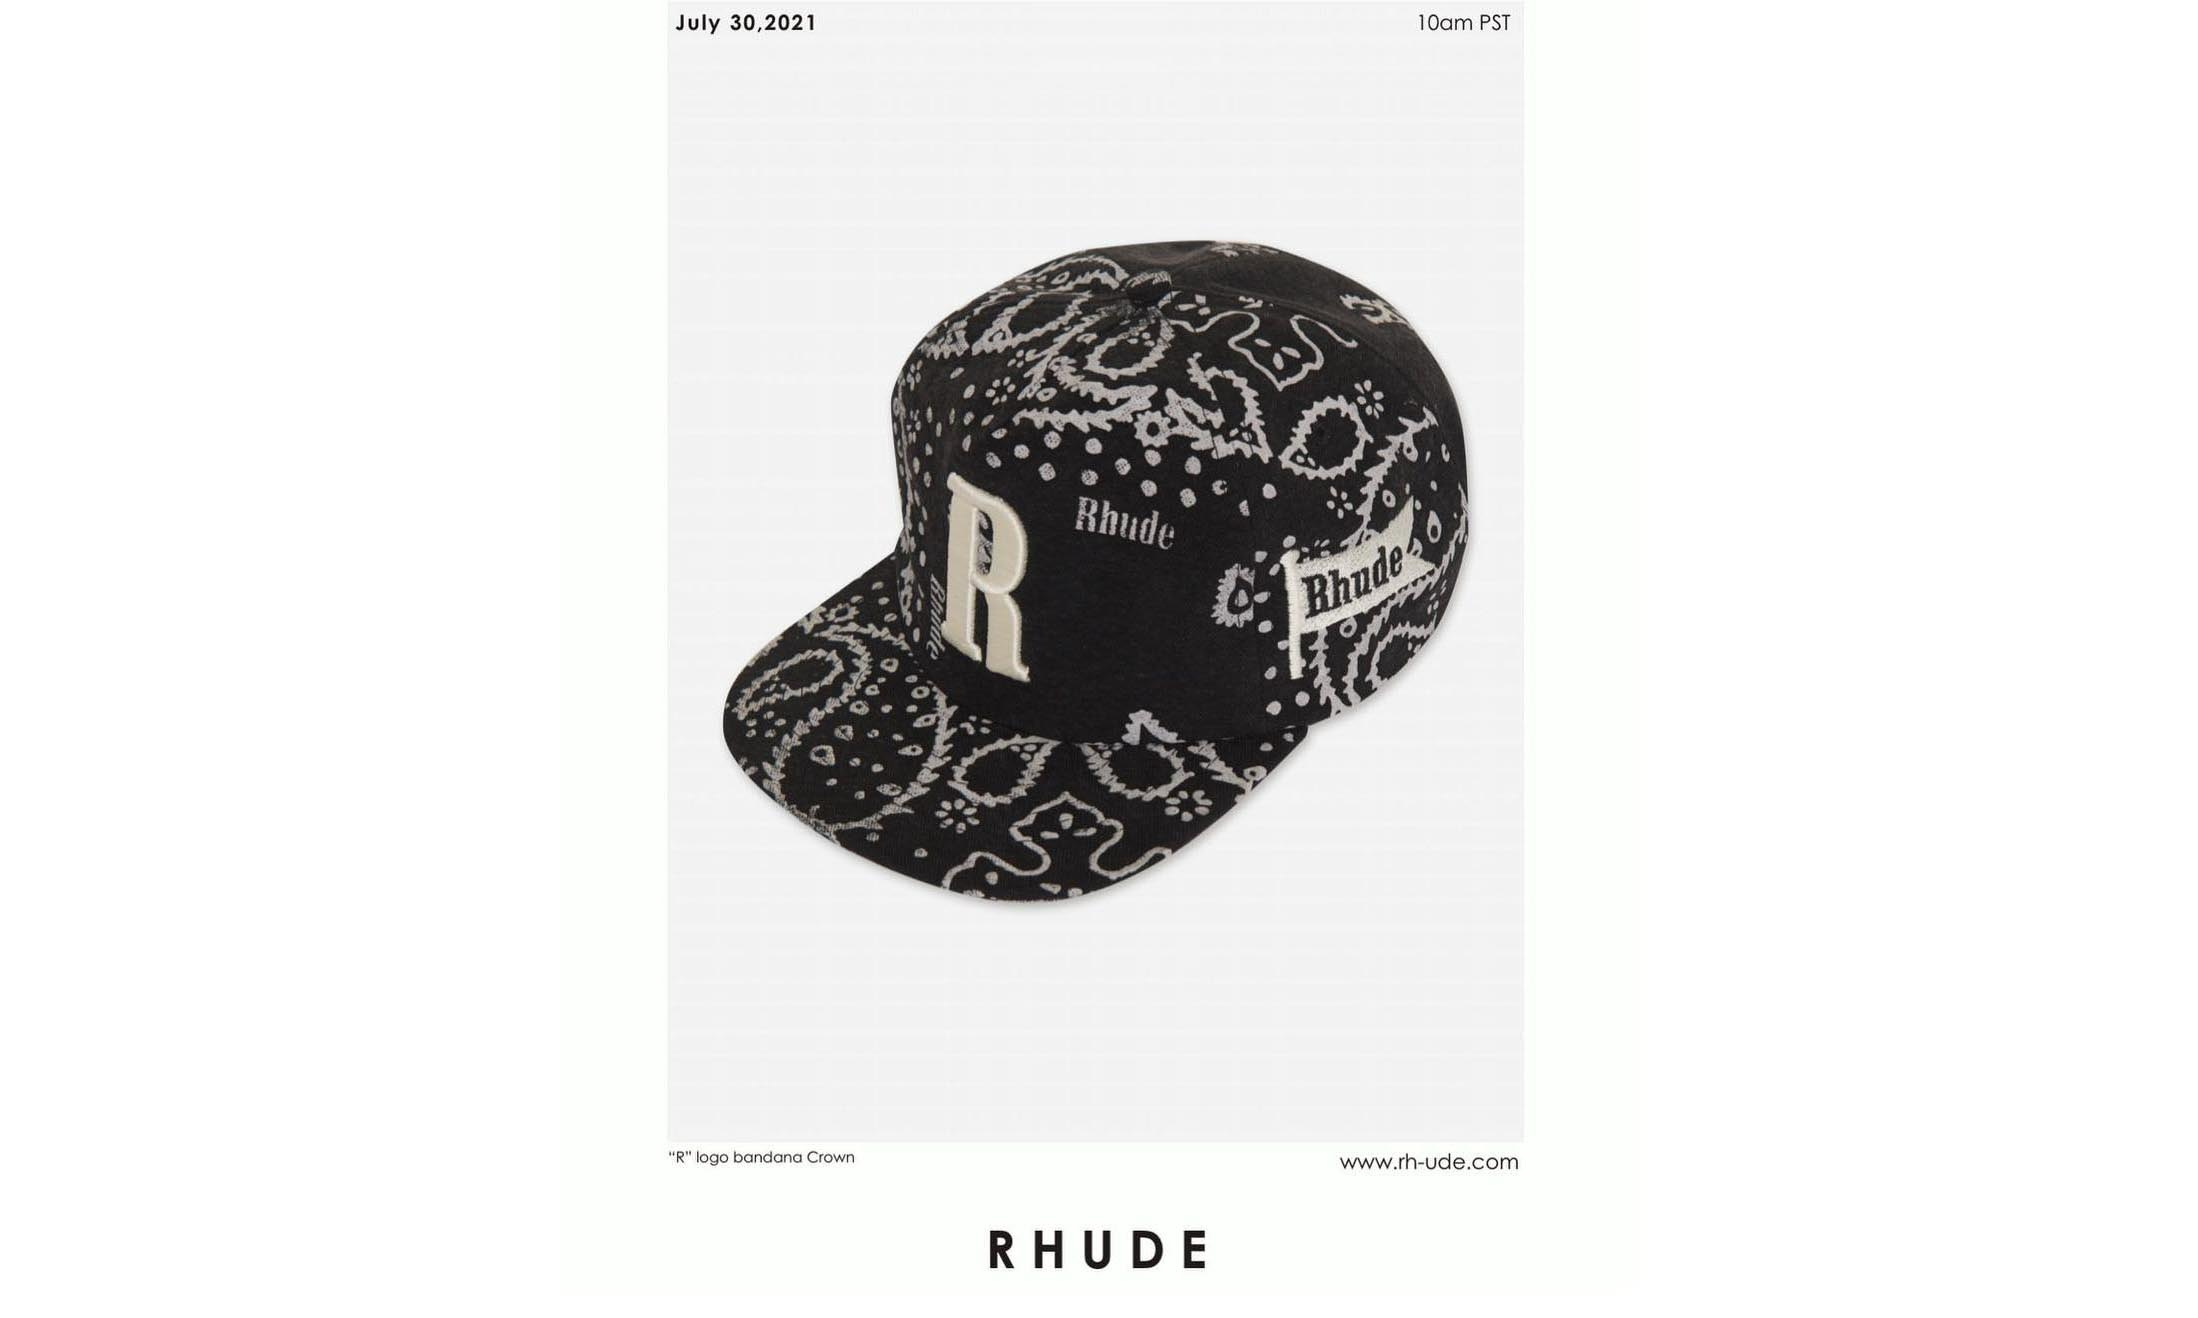 RHUDE 发布超限定腰果花帽款